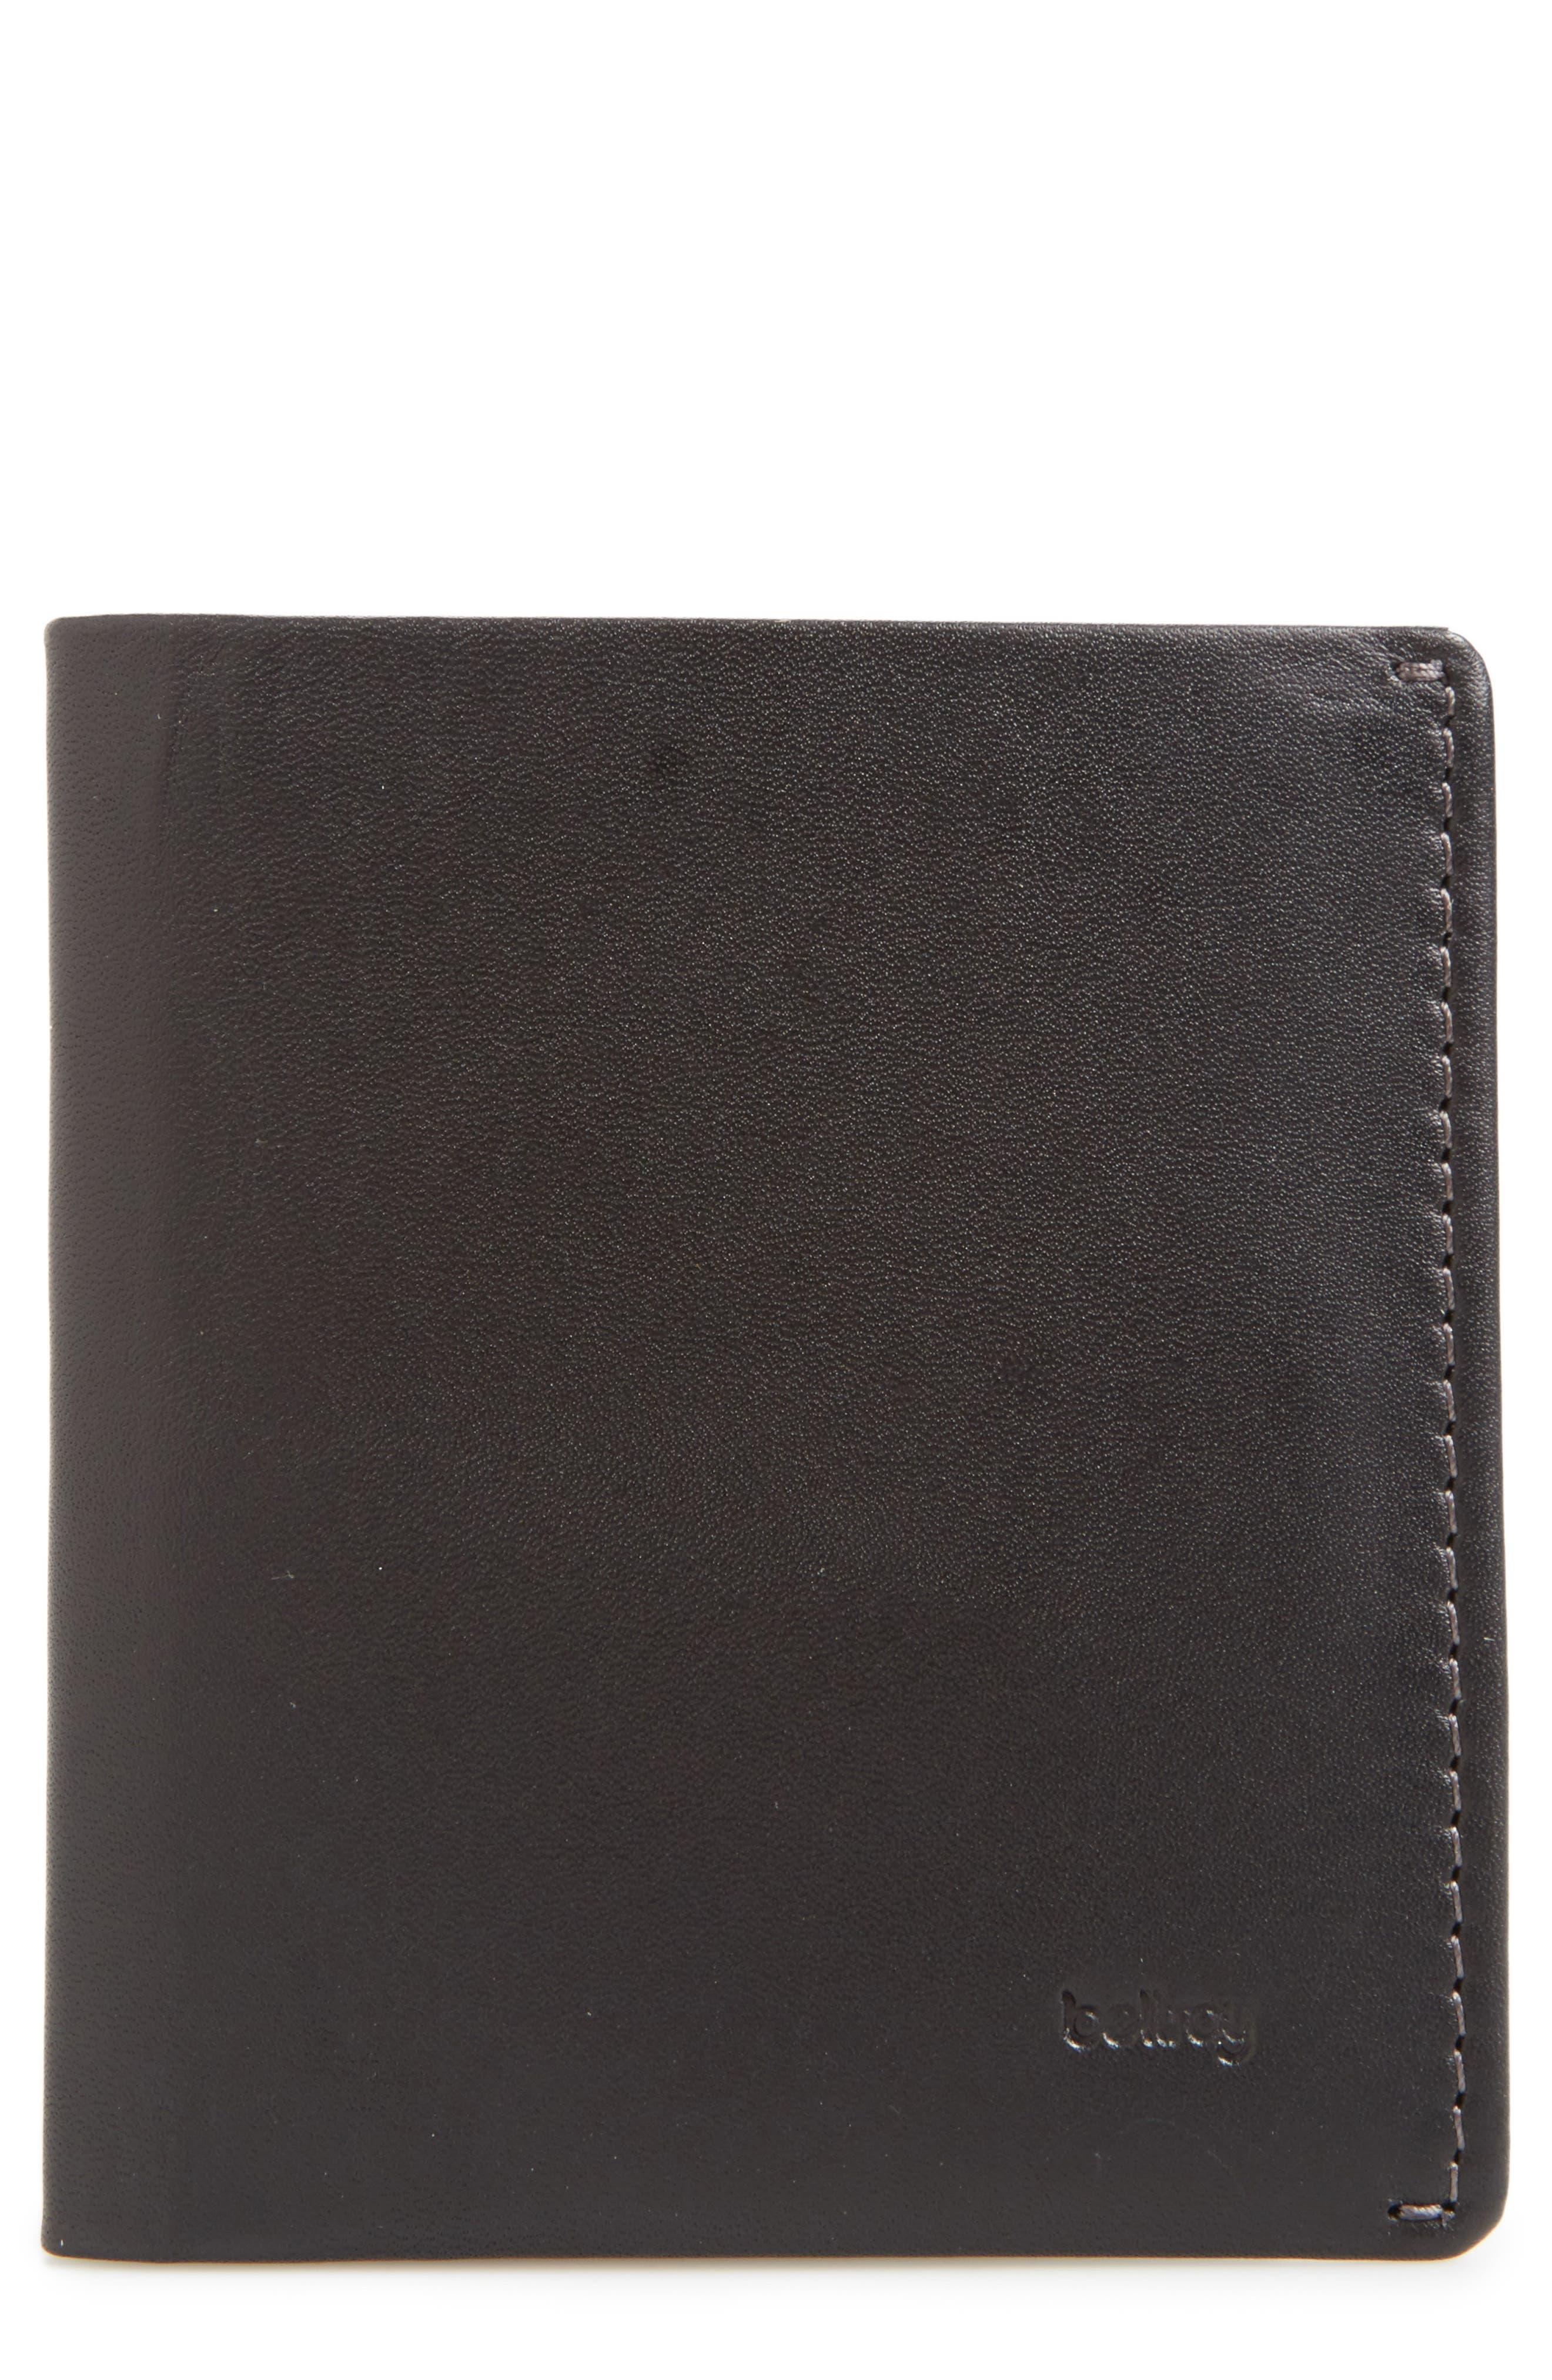 Alternate Image 1 Selected - Bellroy Note Sleeve Wallet